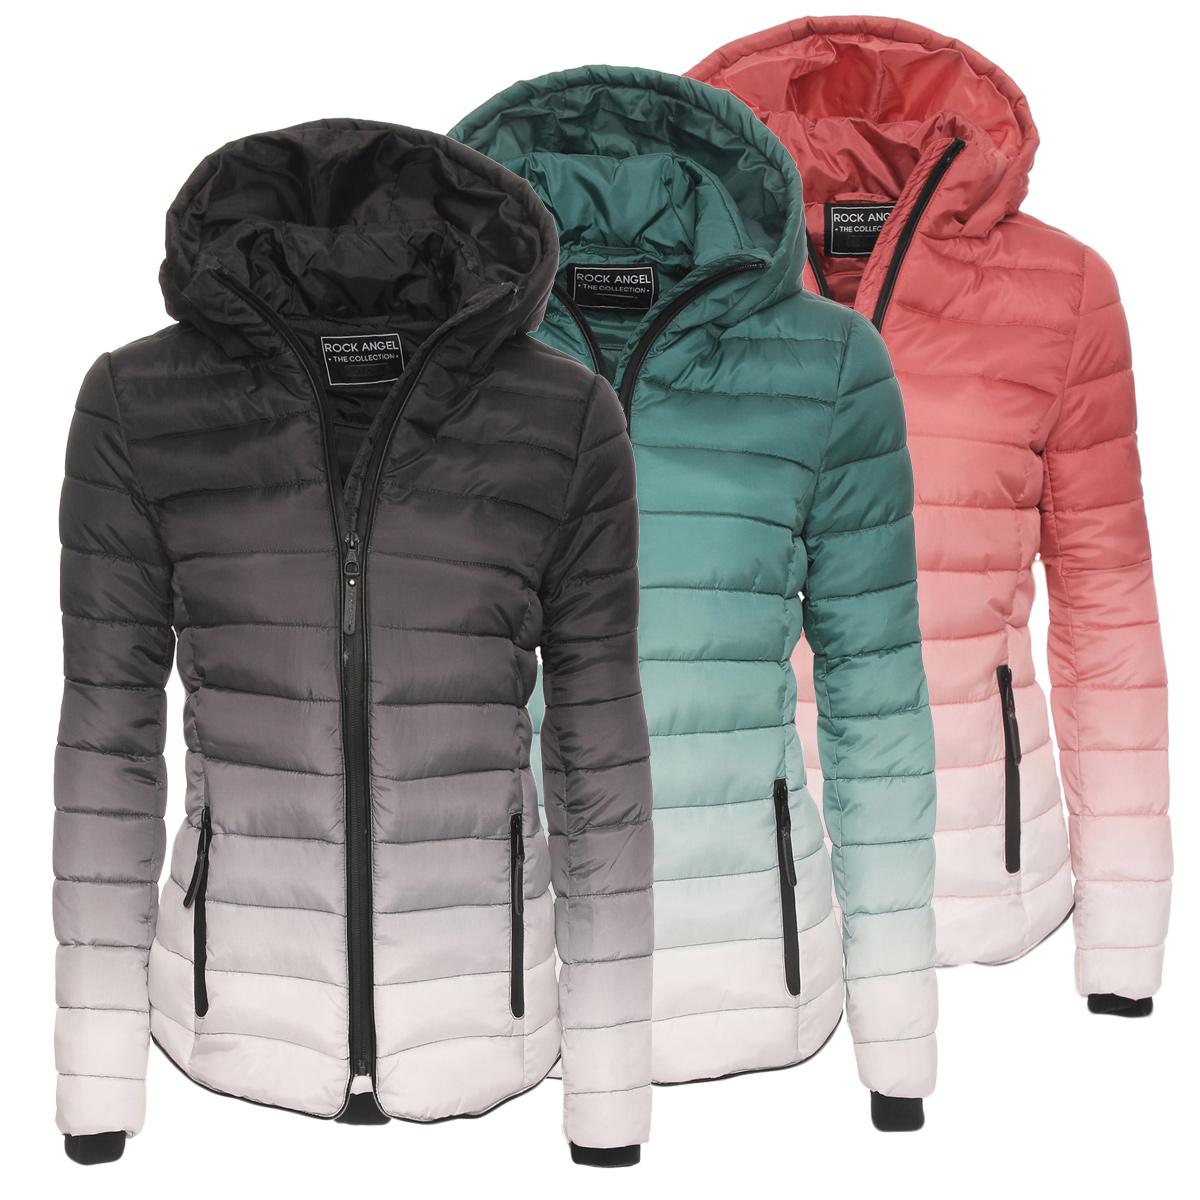 rock angel women 39 s winter quilted jacket hood transition jacket size m l xl 44366a ebay. Black Bedroom Furniture Sets. Home Design Ideas